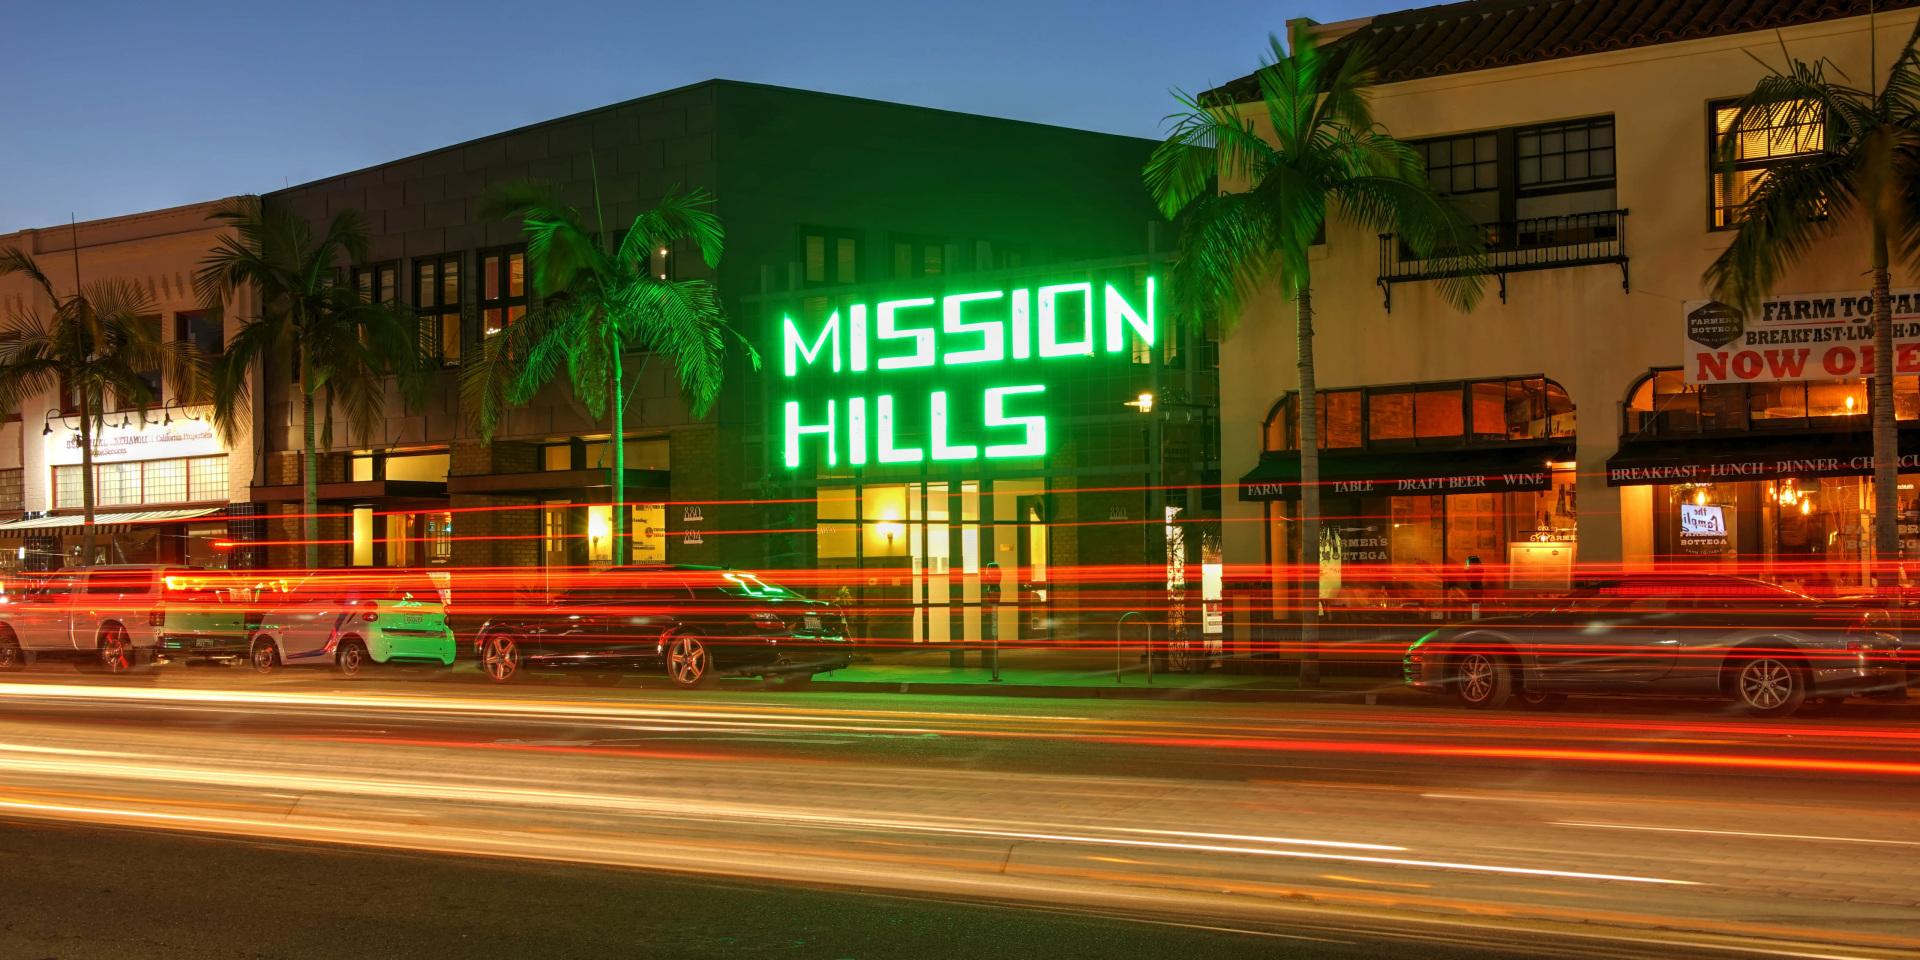 Mission Hills Build